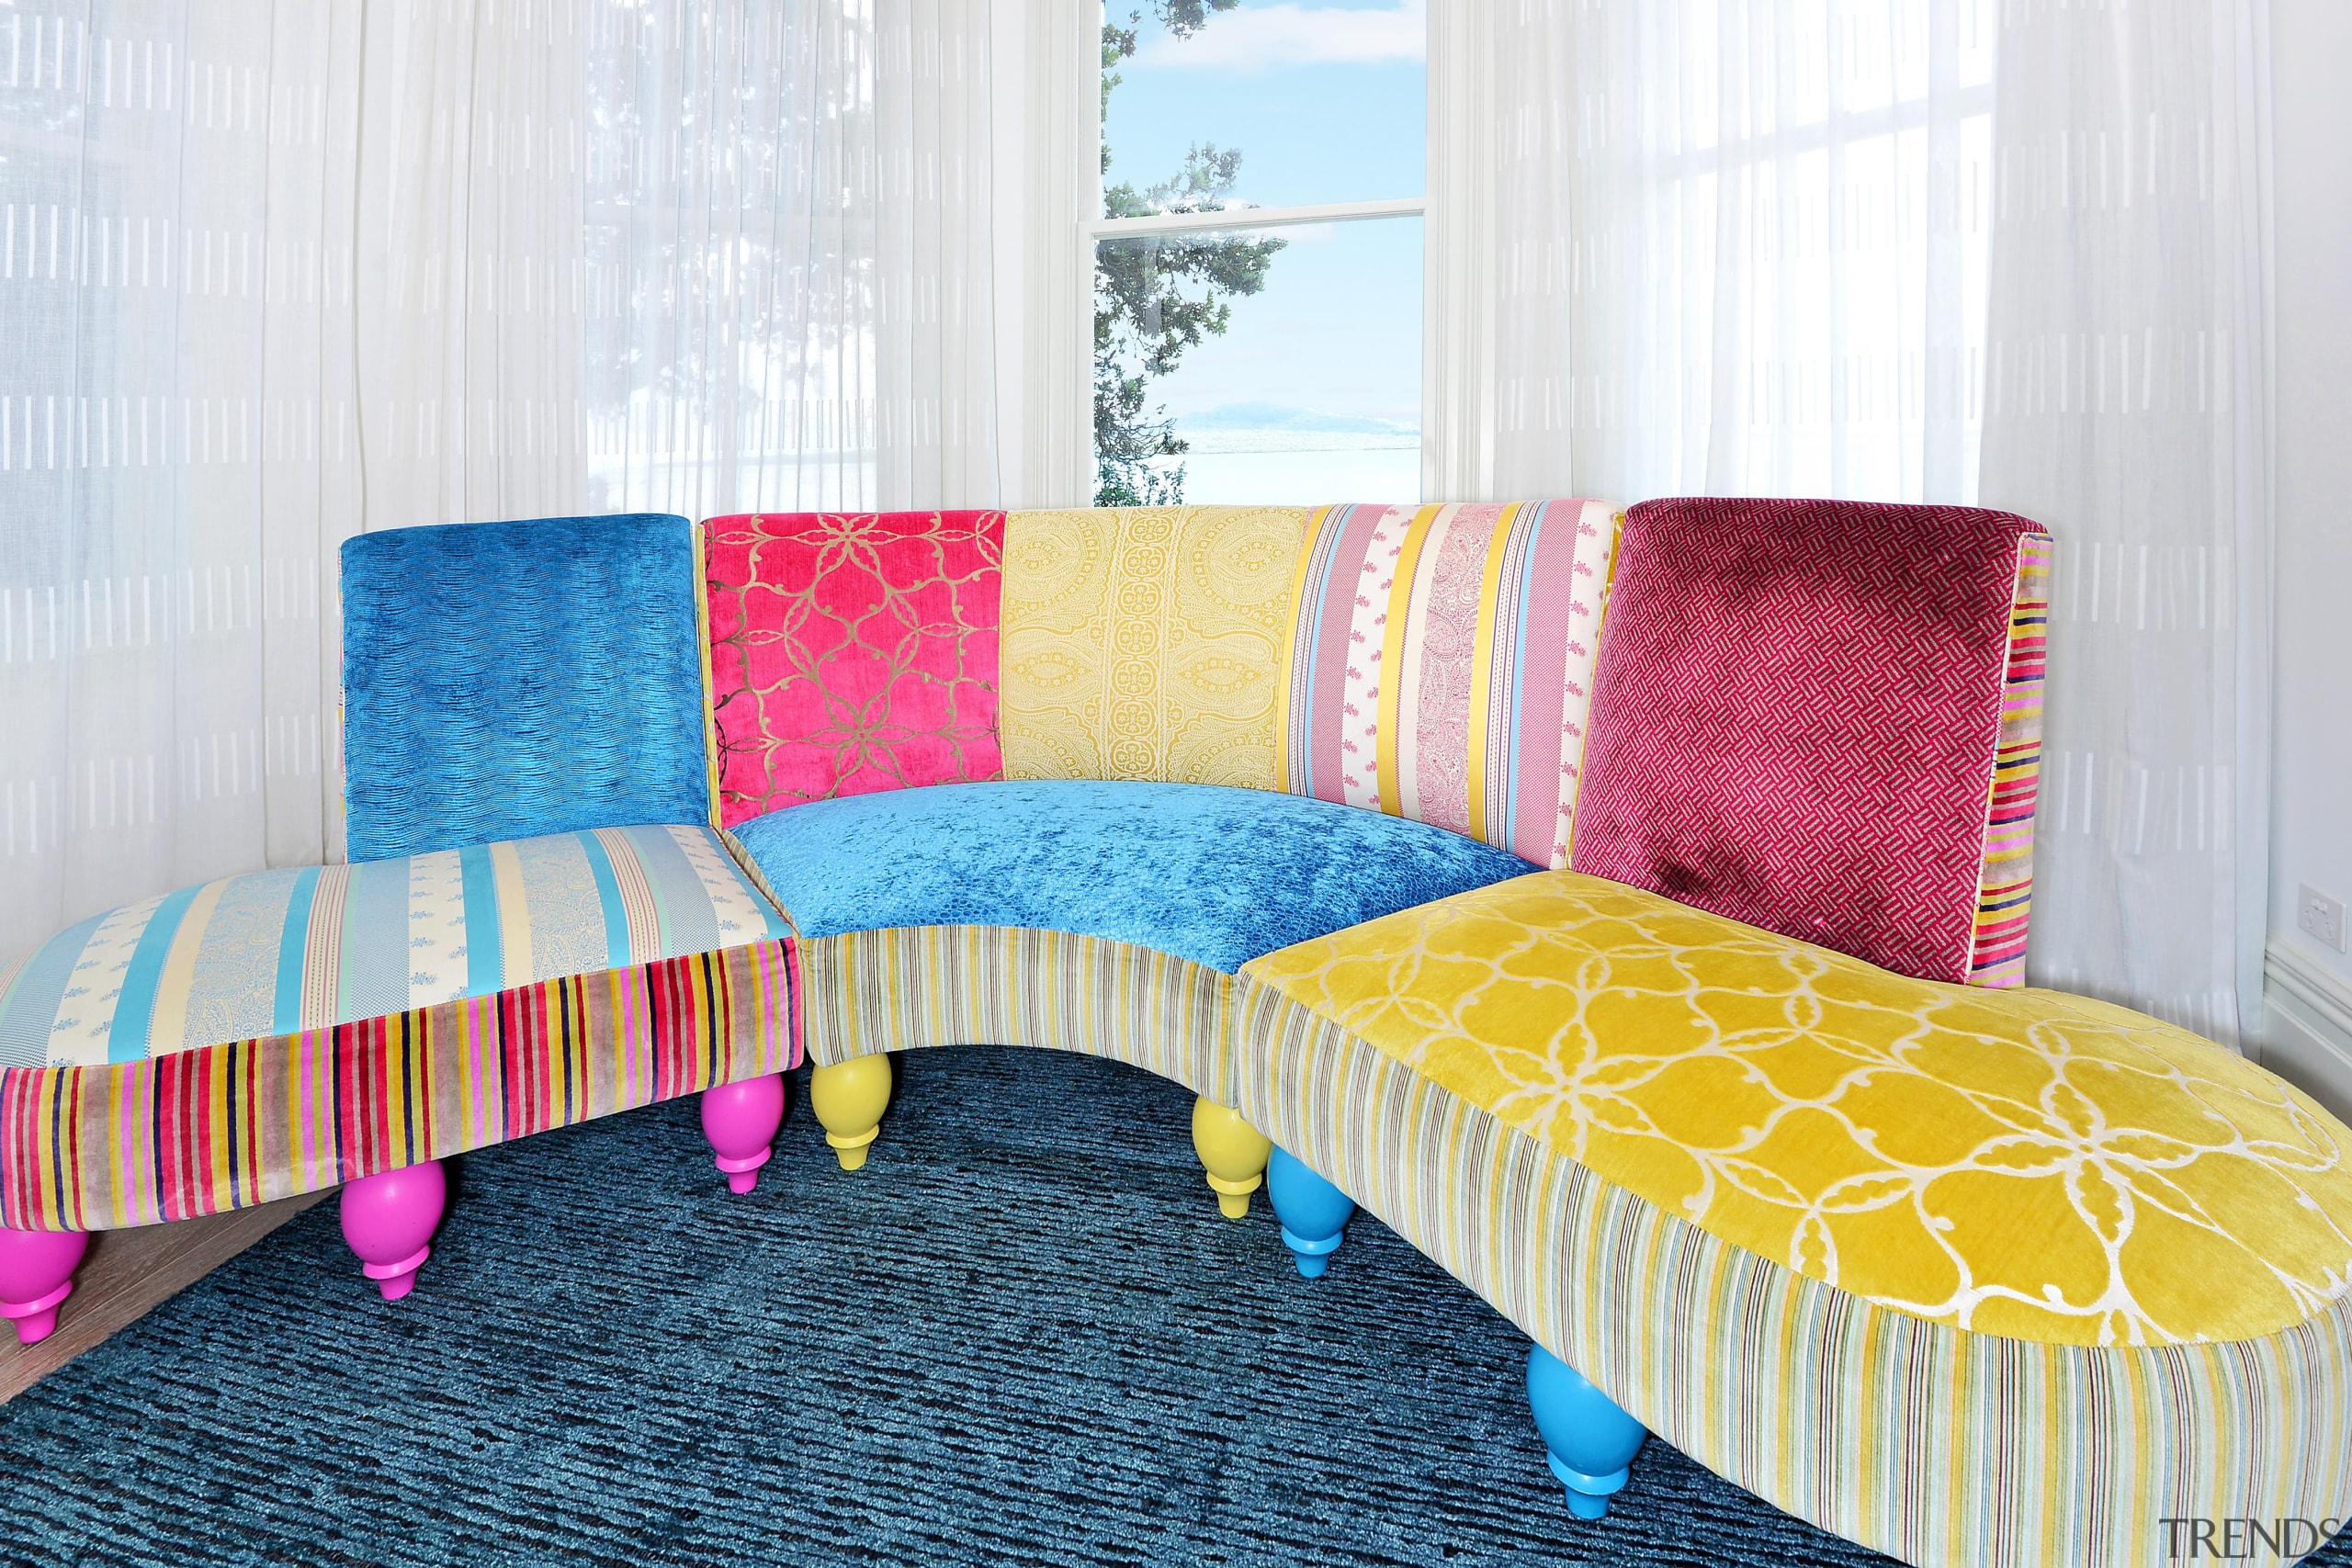 6002960.jpg - 6002960.jpg - chair   couch   chair, couch, cushion, furniture, interior design, table, textile, white